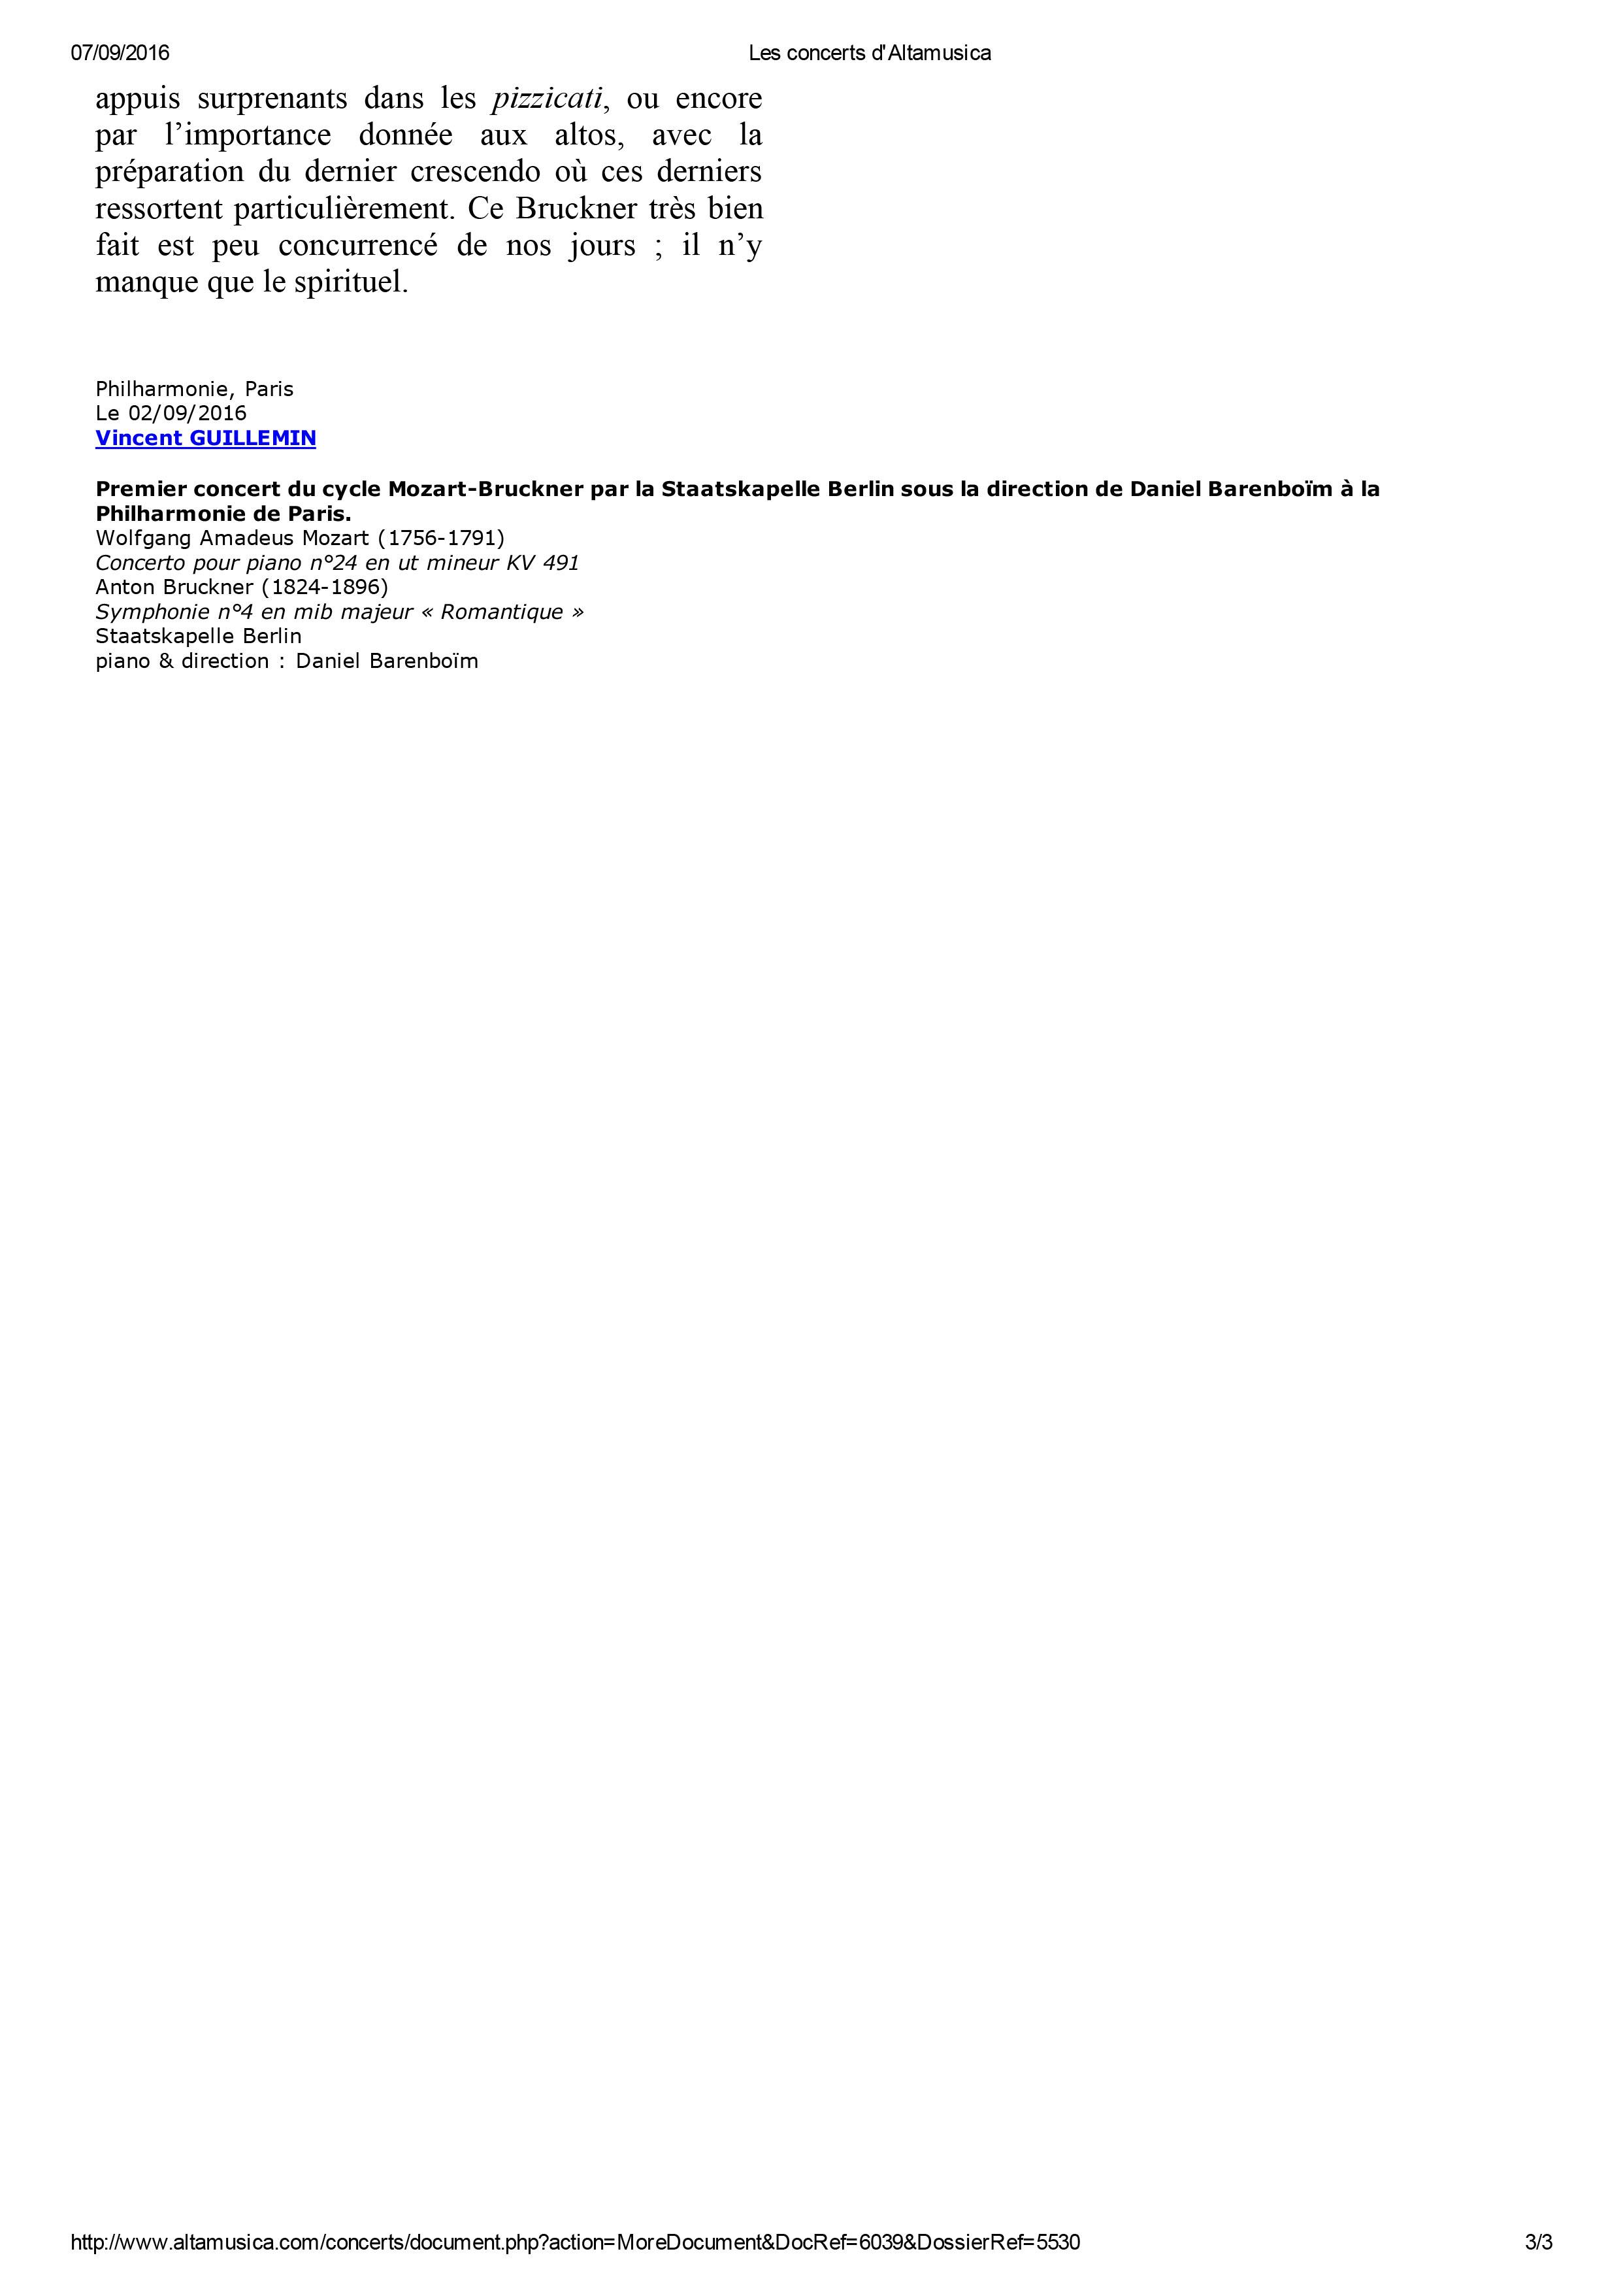 Altamusica1-3.jpg